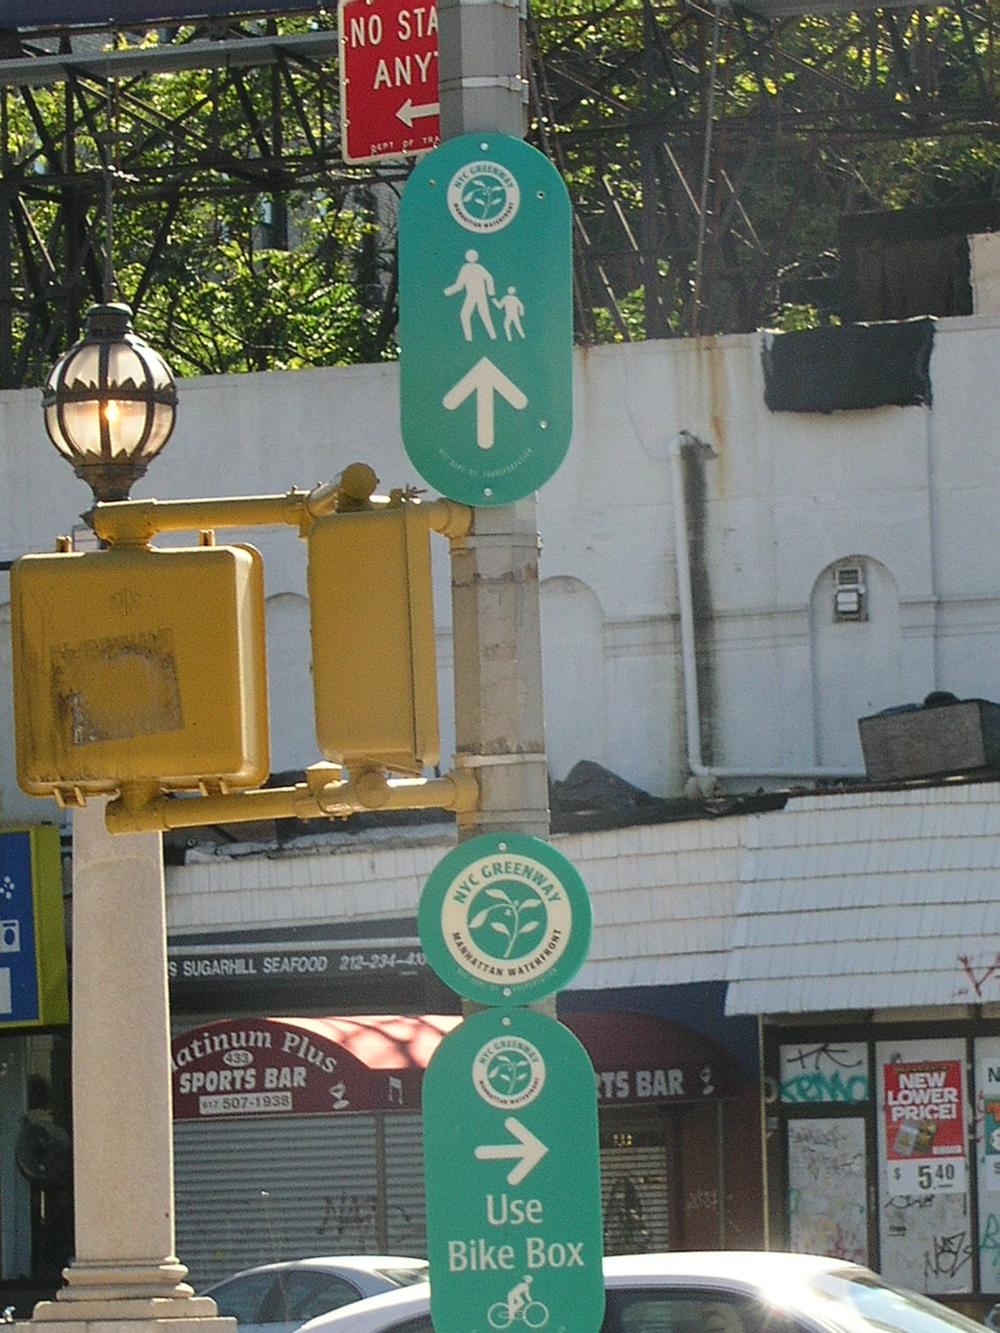 Idiotic street signs